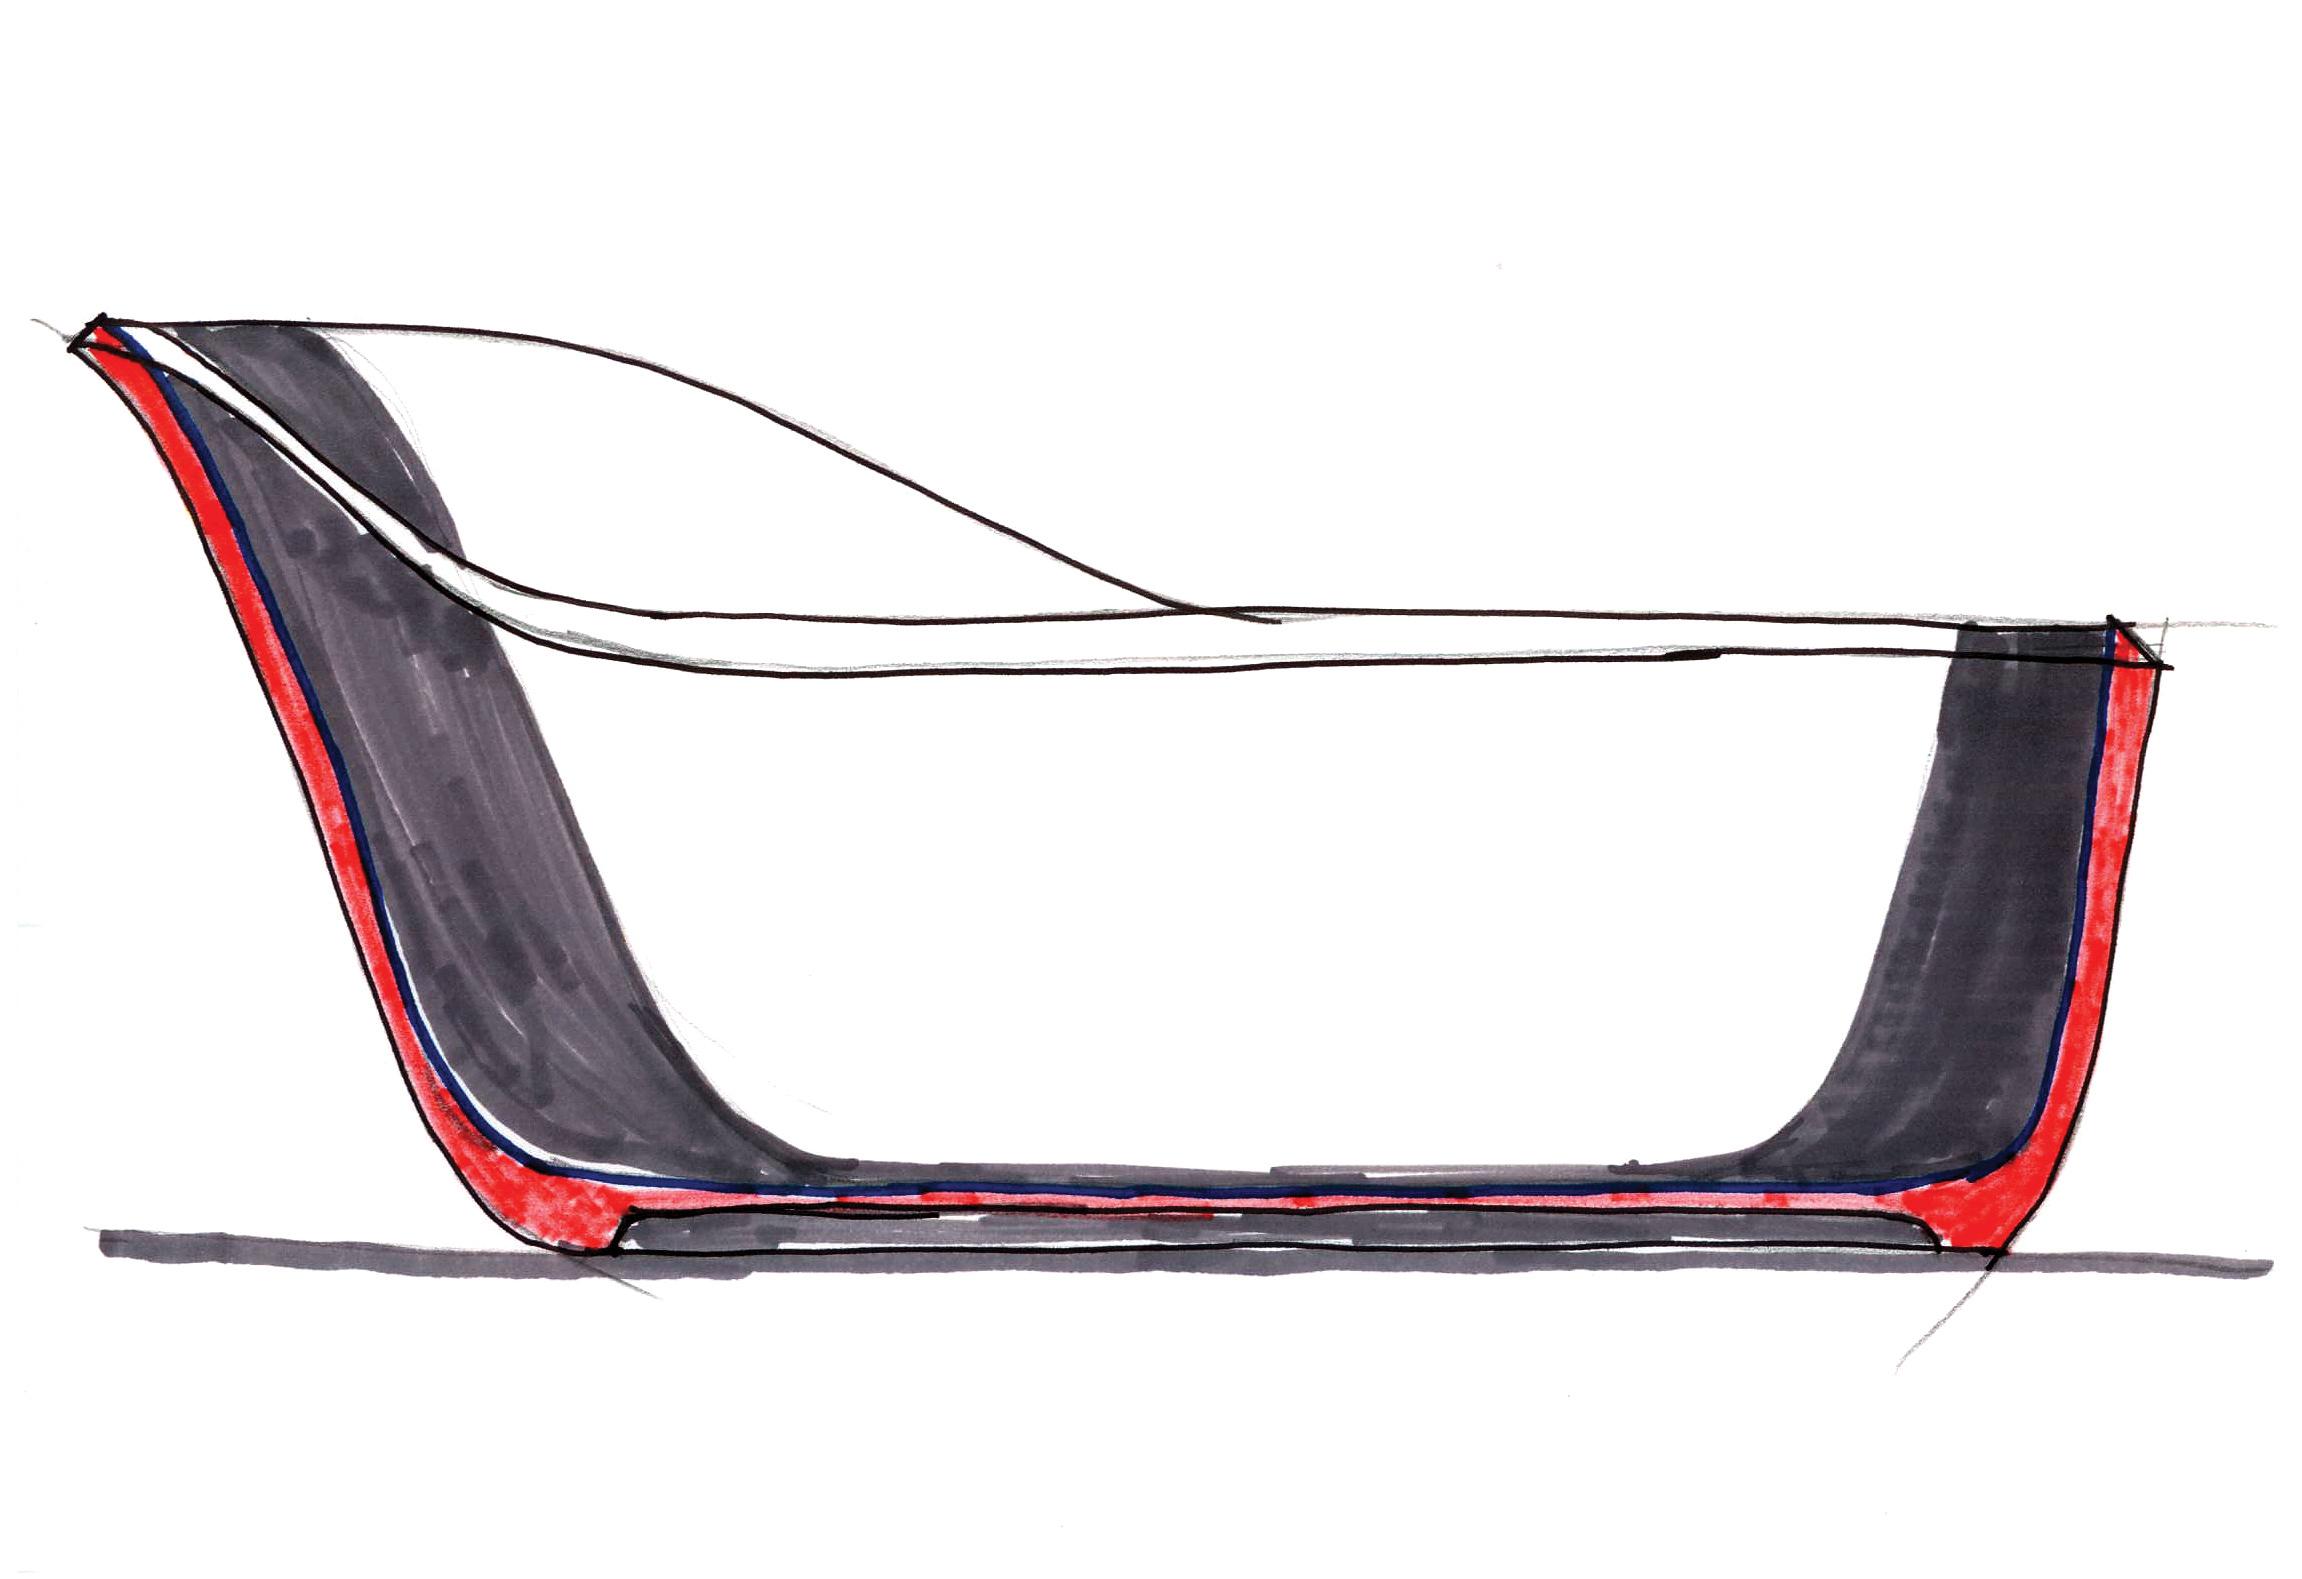 Sketch of the Wanda bathtub by Debiasi Sandri for Antoniolupi